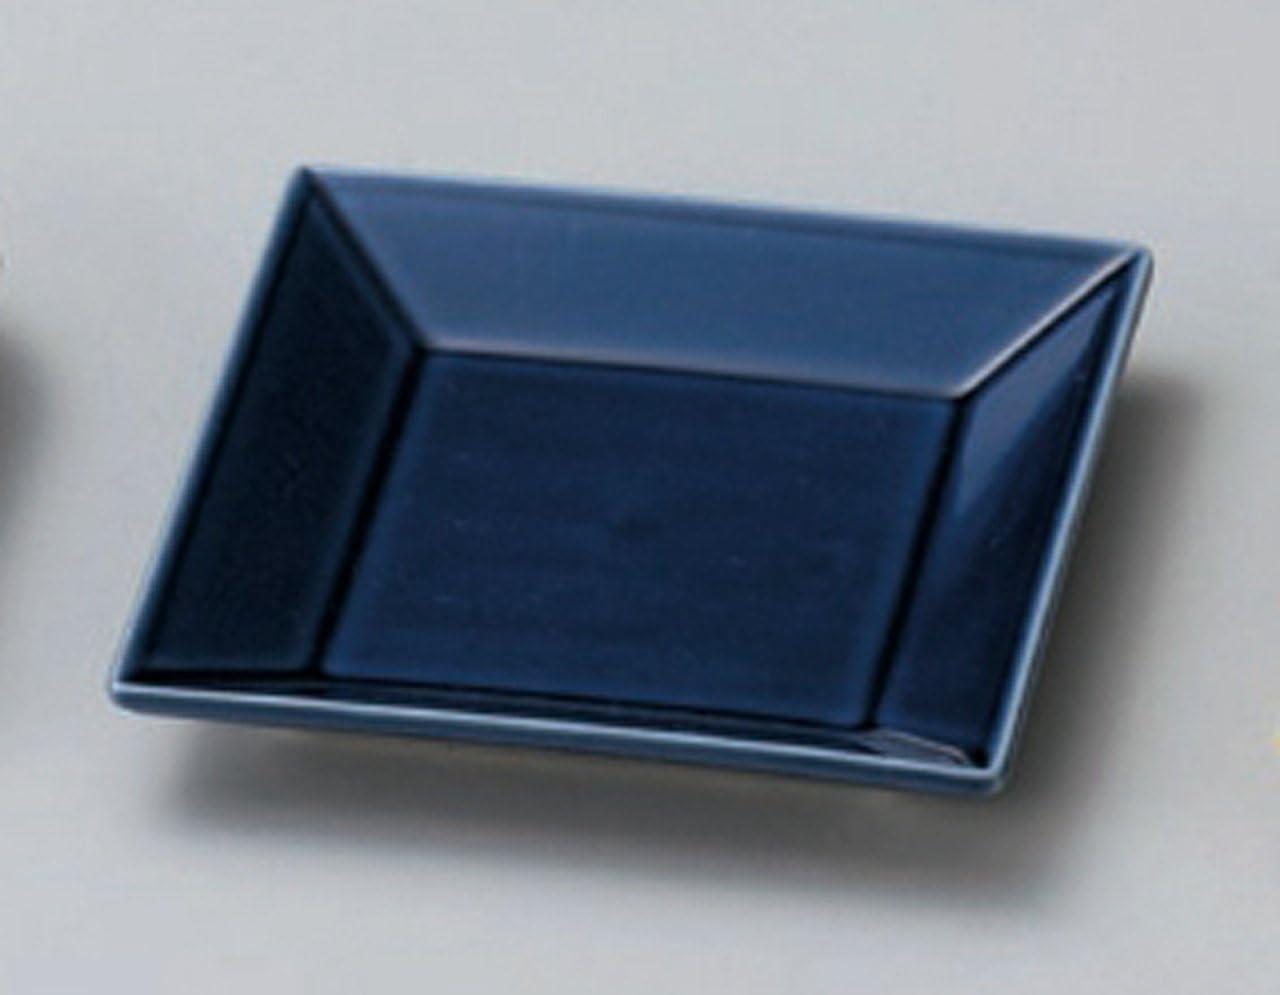 RURI 4.3inches Set of 5 Small Plates Japanese original Porcelain 61UIwxr6LVLSL1280_